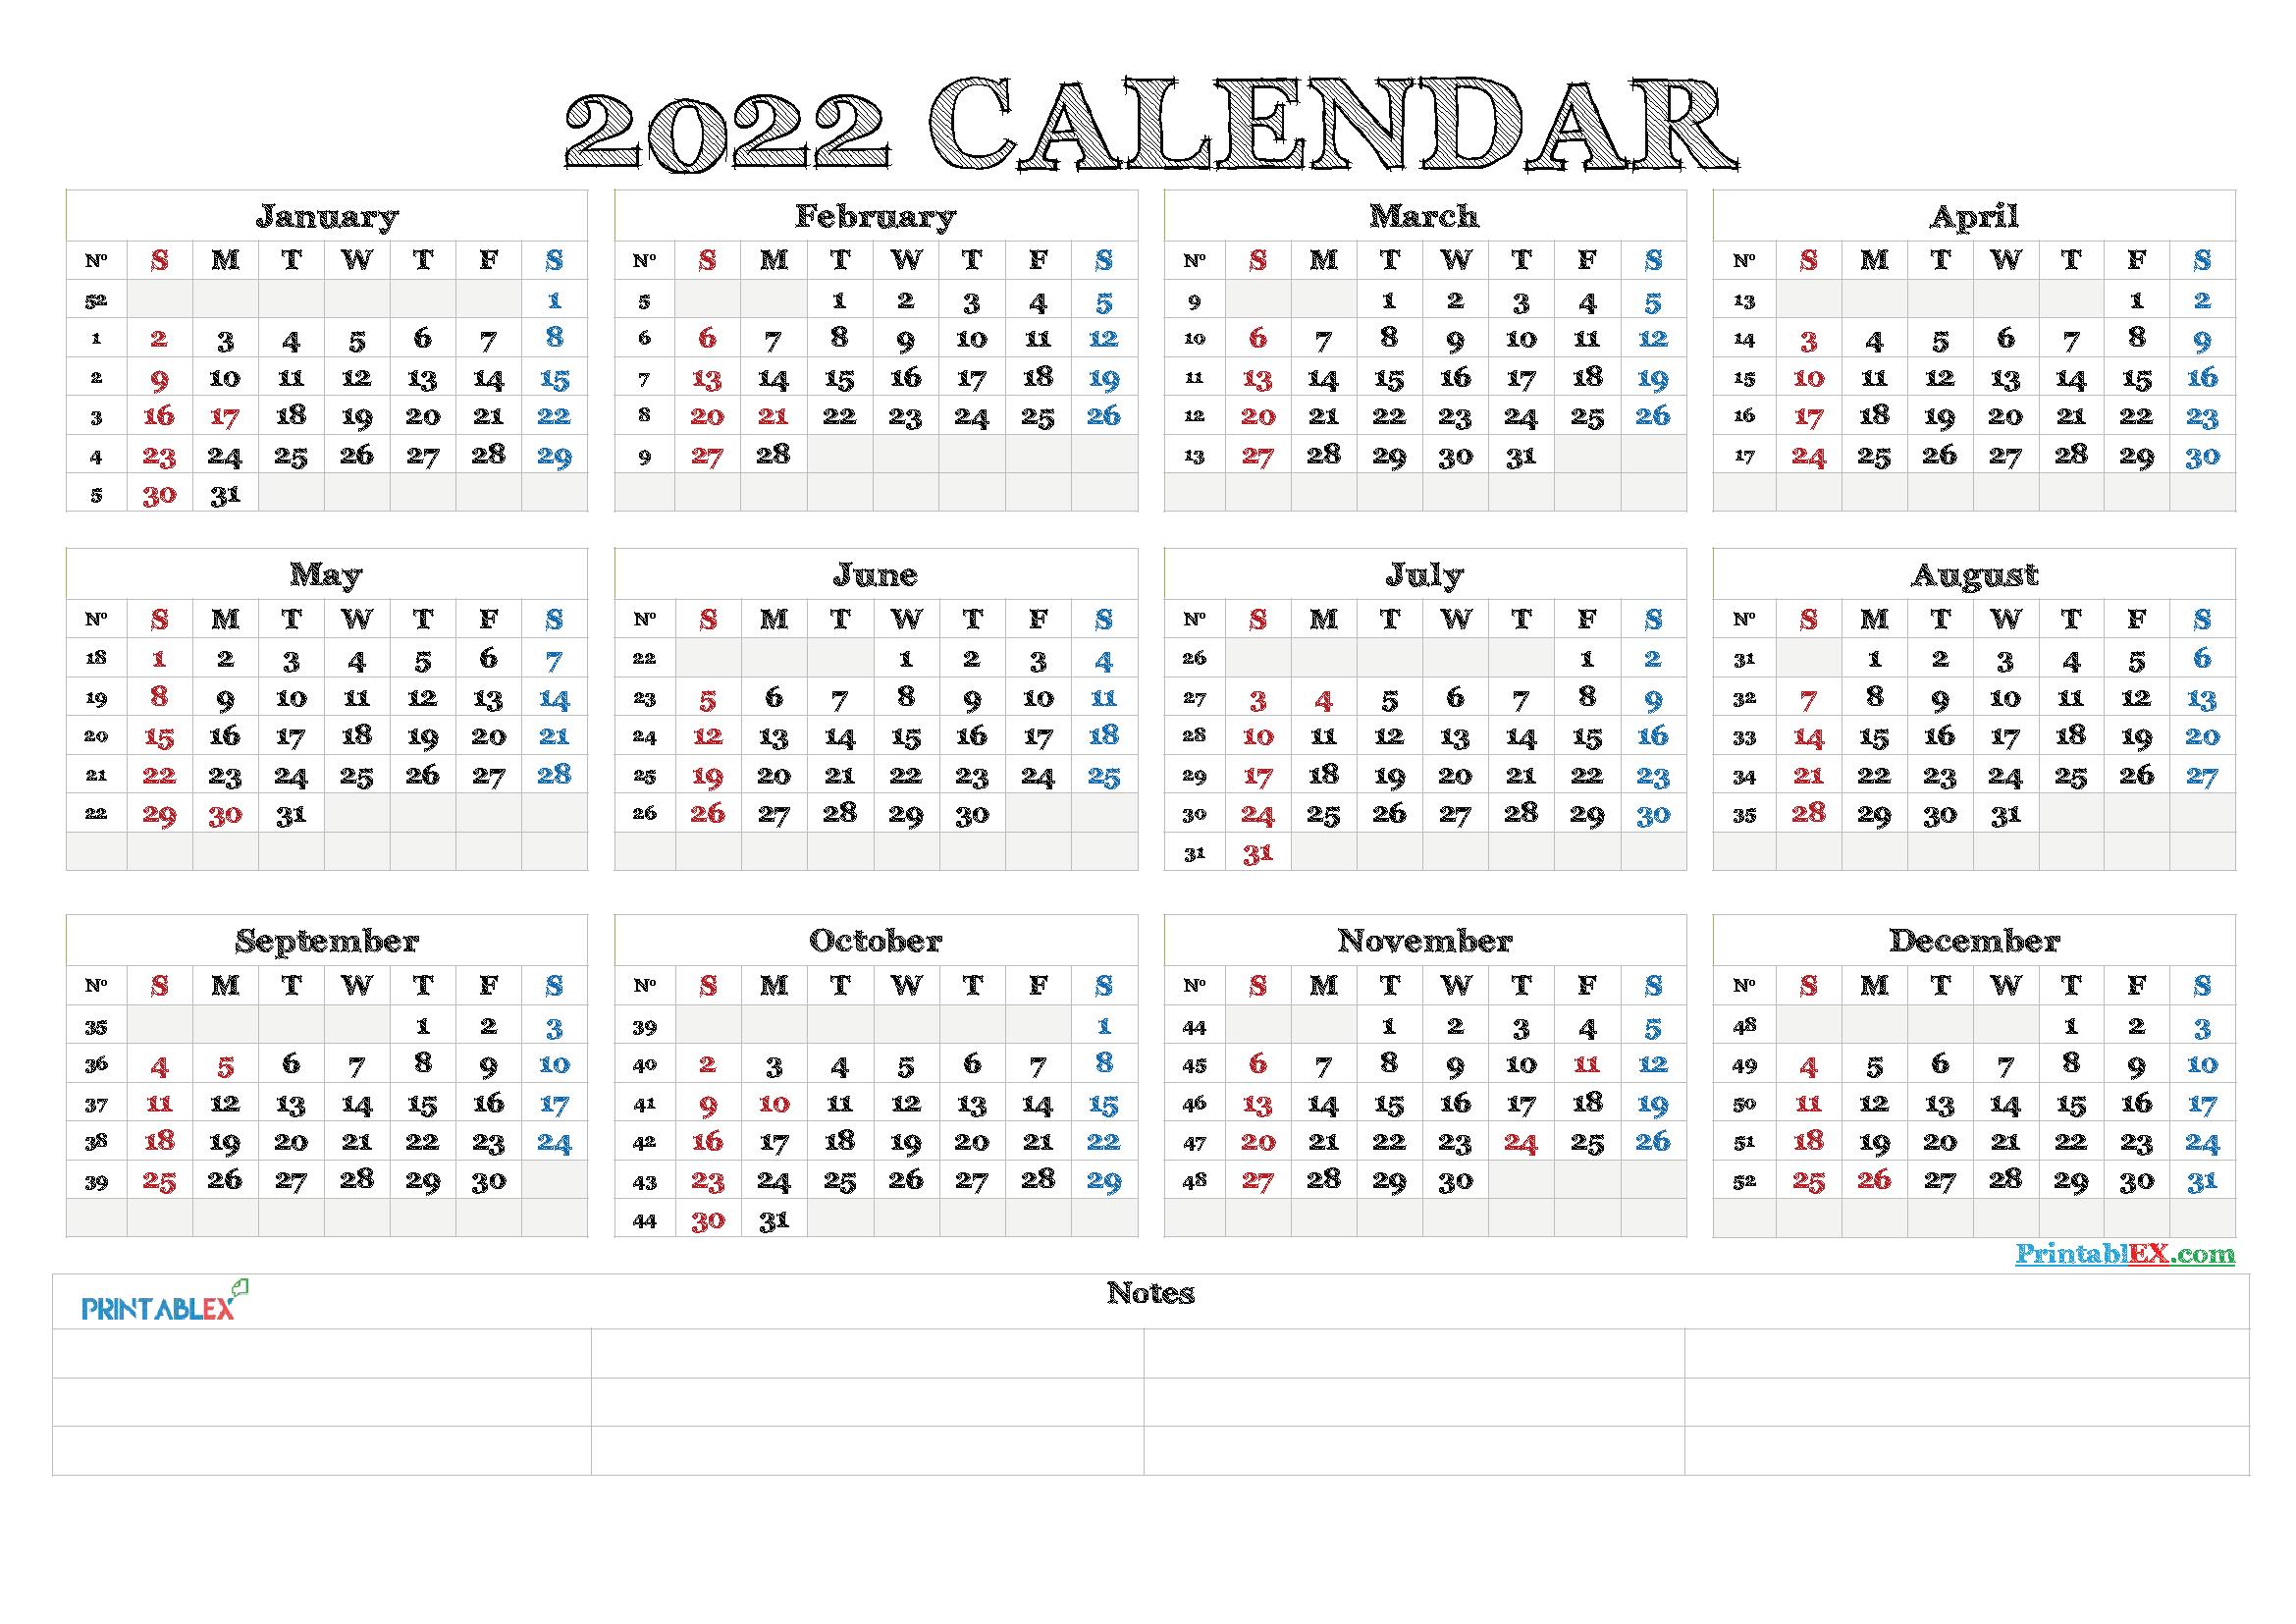 Free Printable Calendar Templates 2022 - 22Ytw83